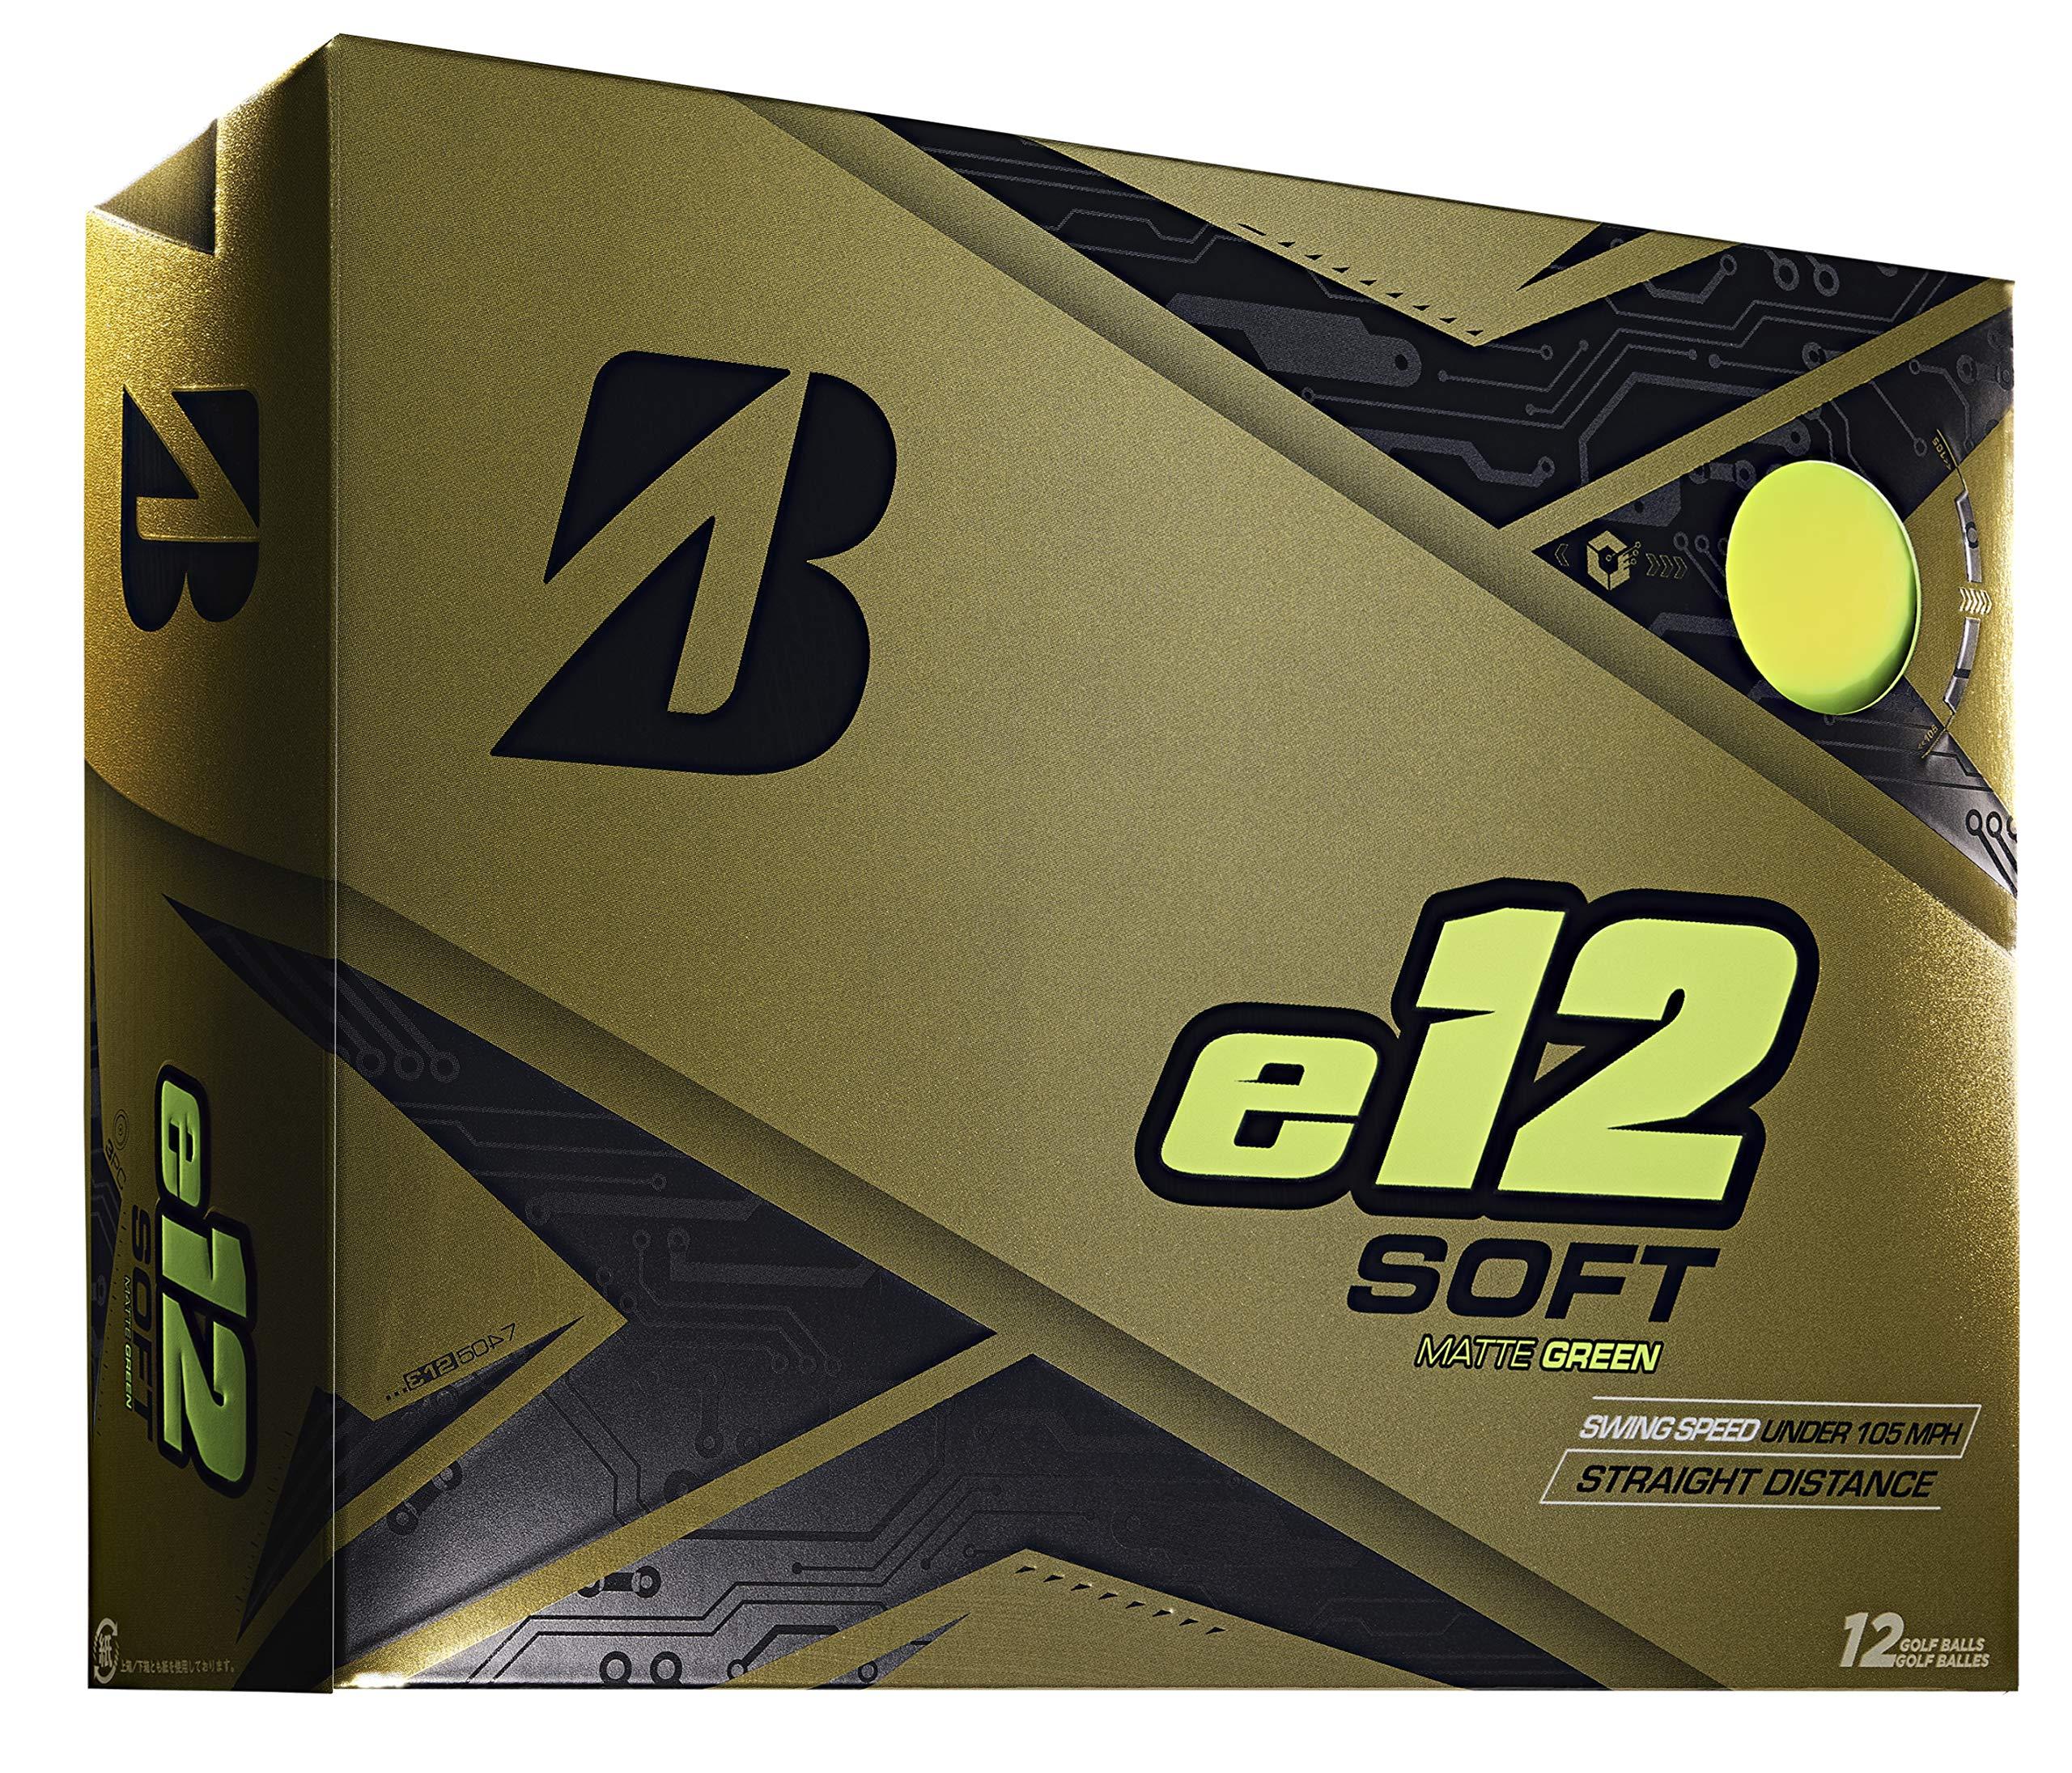 Bridgestone Golf e12 Soft Golf Balls, Matte Green (One Dozen) by Bridgestone Golf